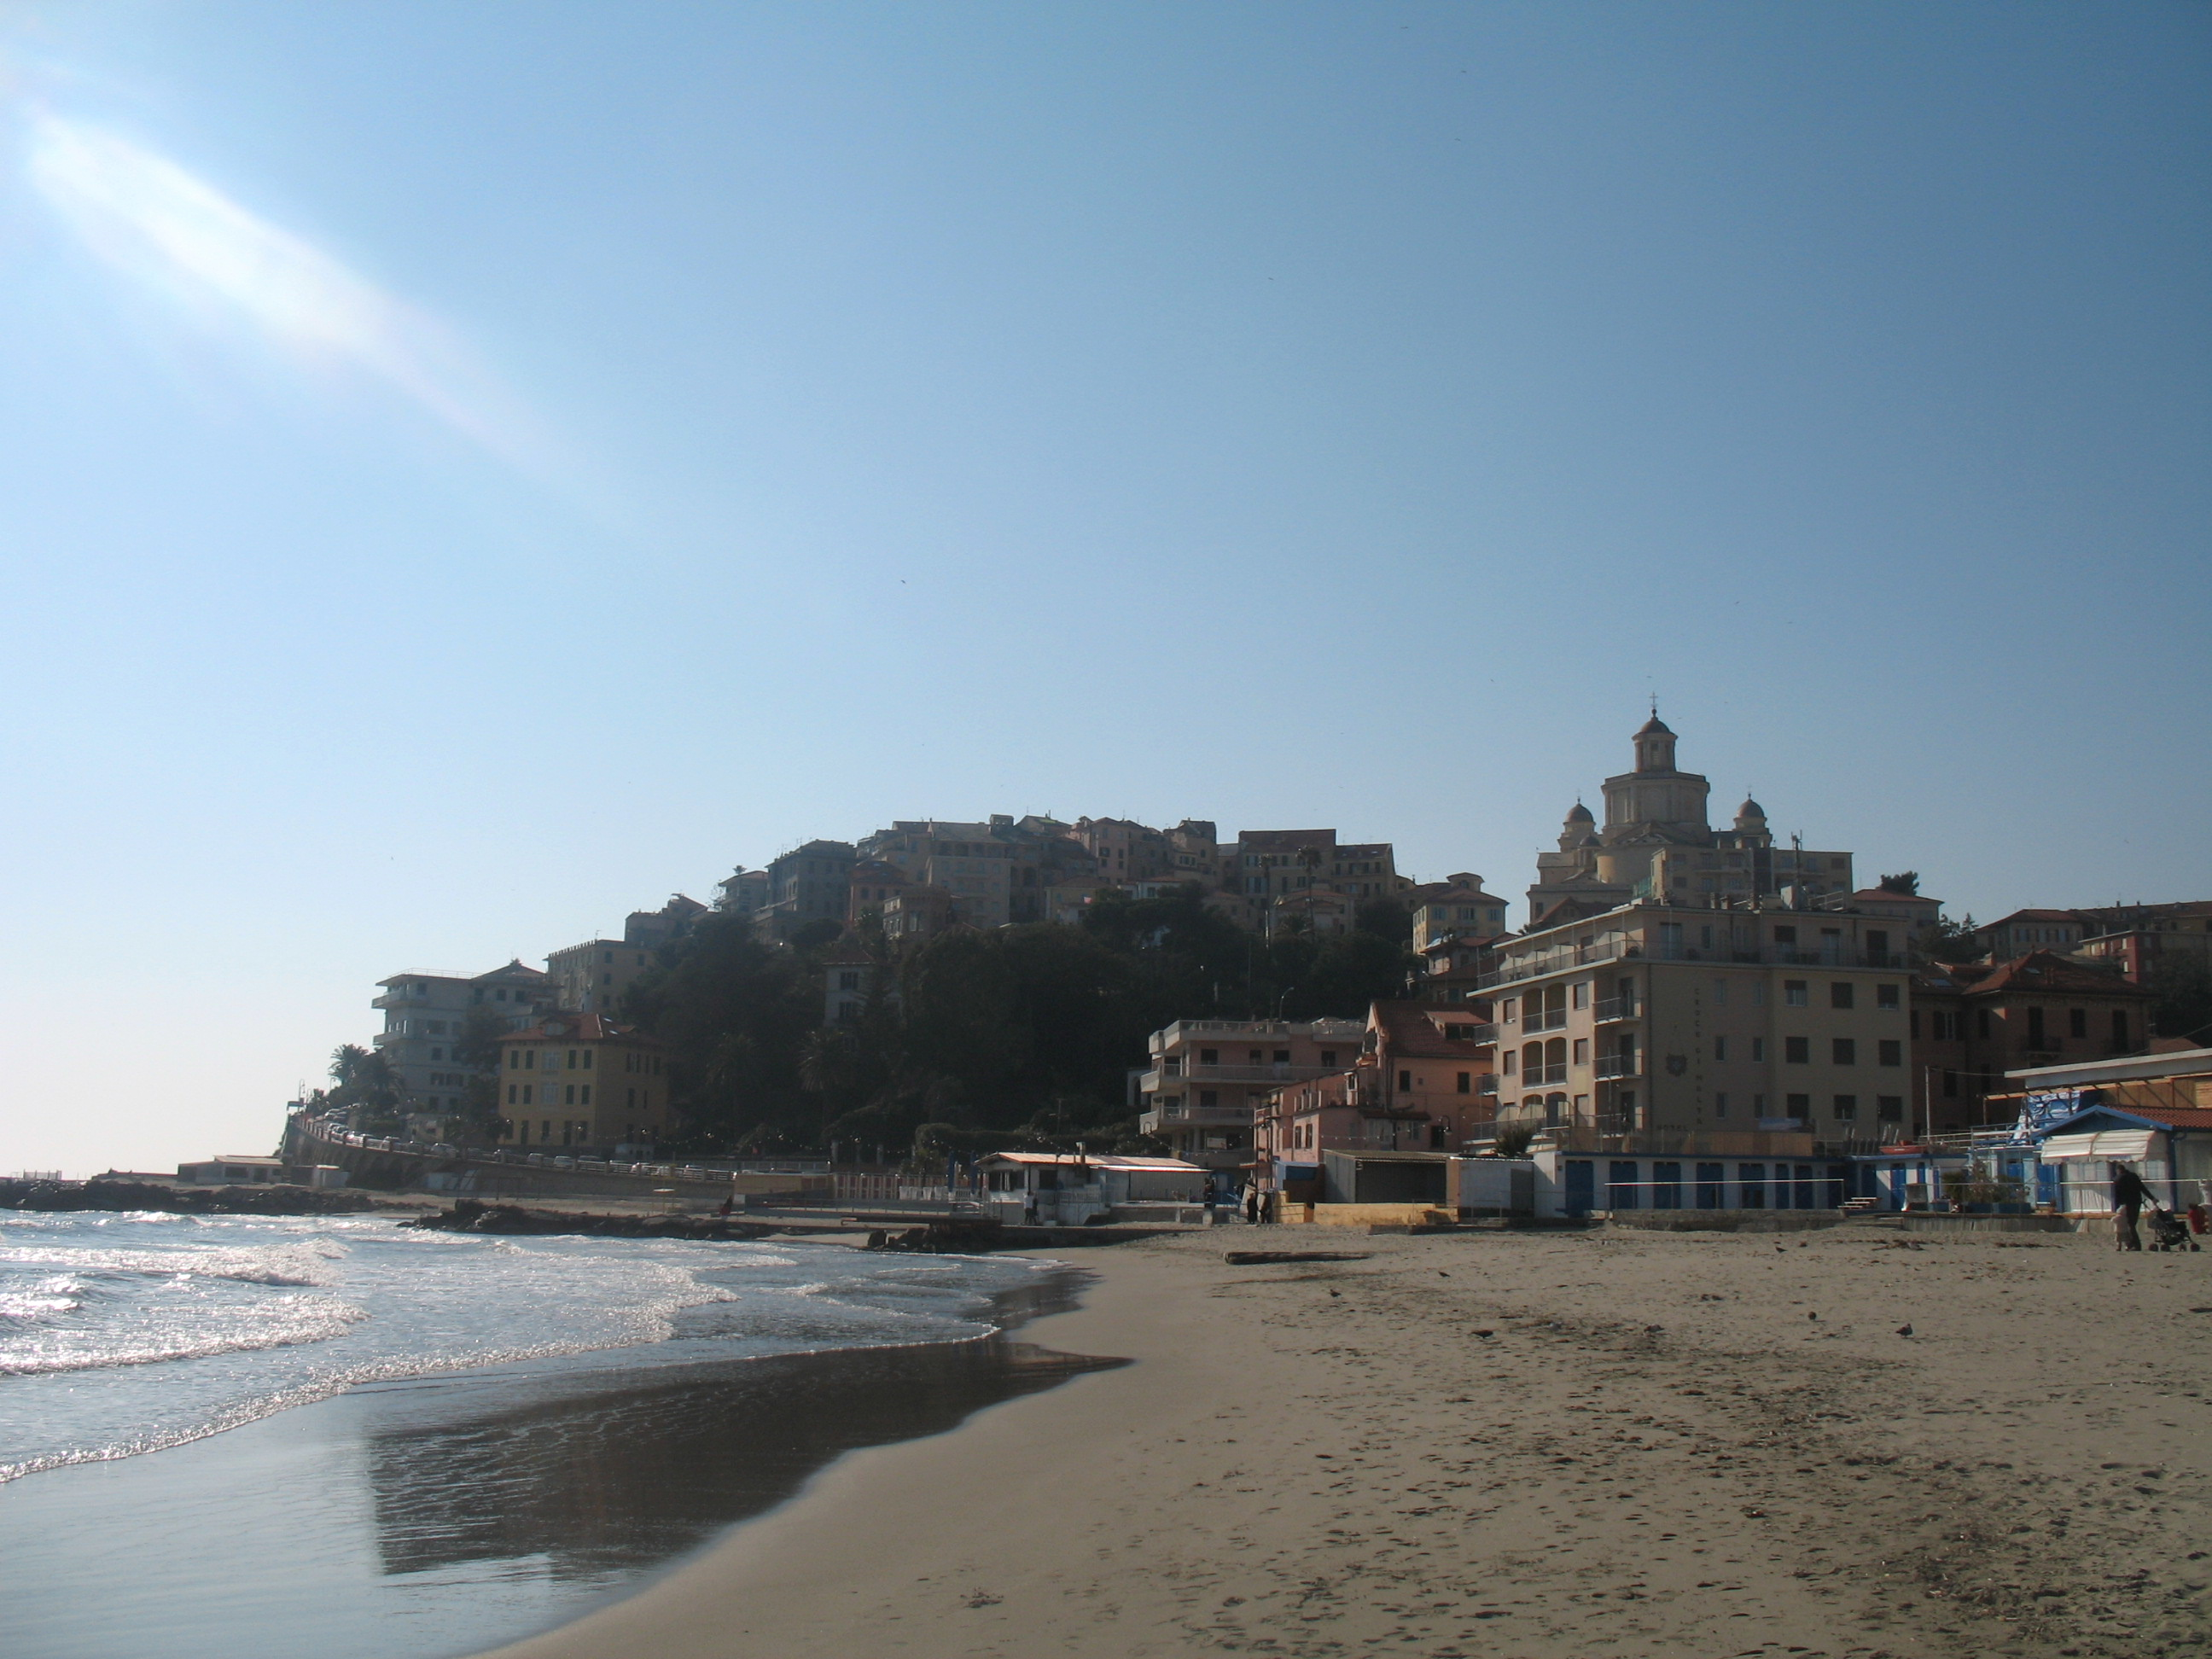 File:Imperia Porto Maurizio-Borgo Marina-IMG 2575.JPG